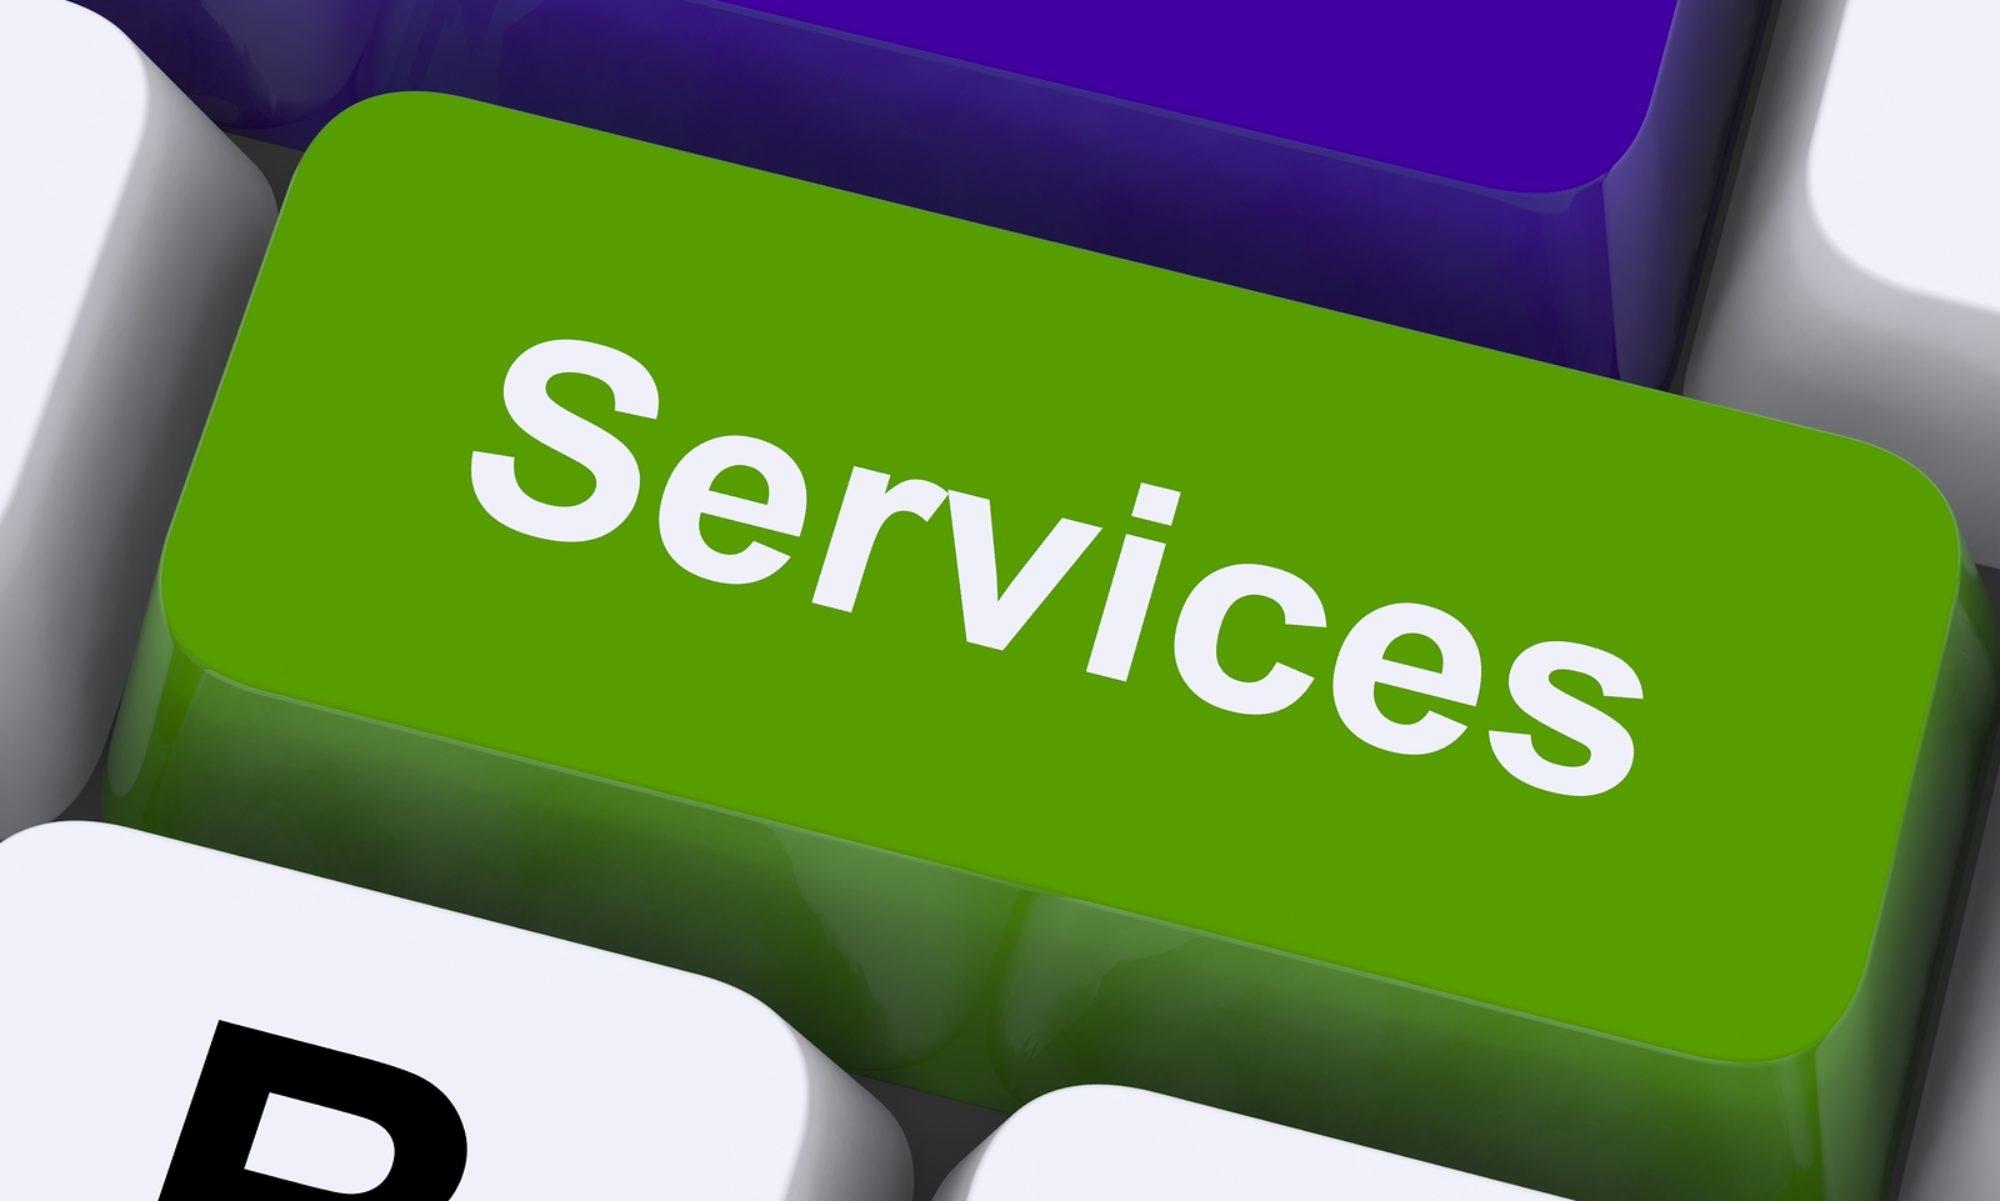 Services establishing new values